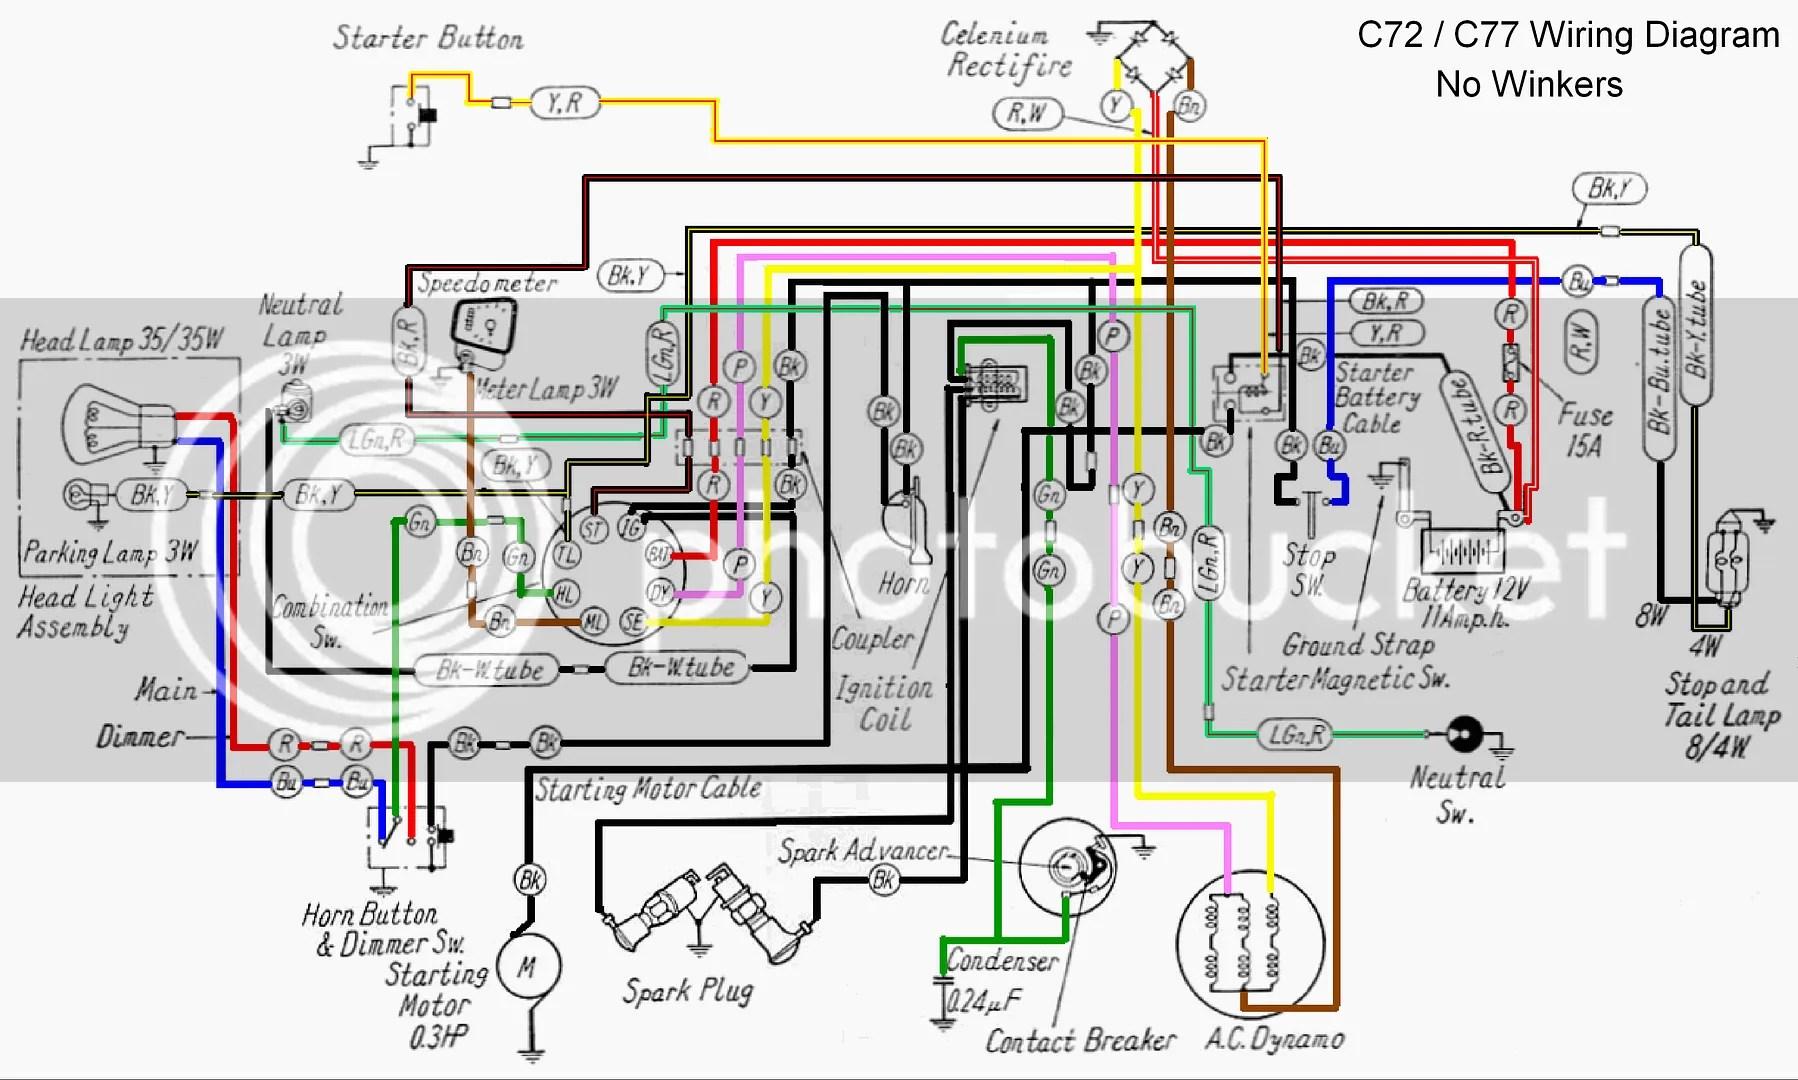 hight resolution of honda dream yuga wiring diagram manual e books kawasaki kx80 wiring diagram honda dream wiring diagram